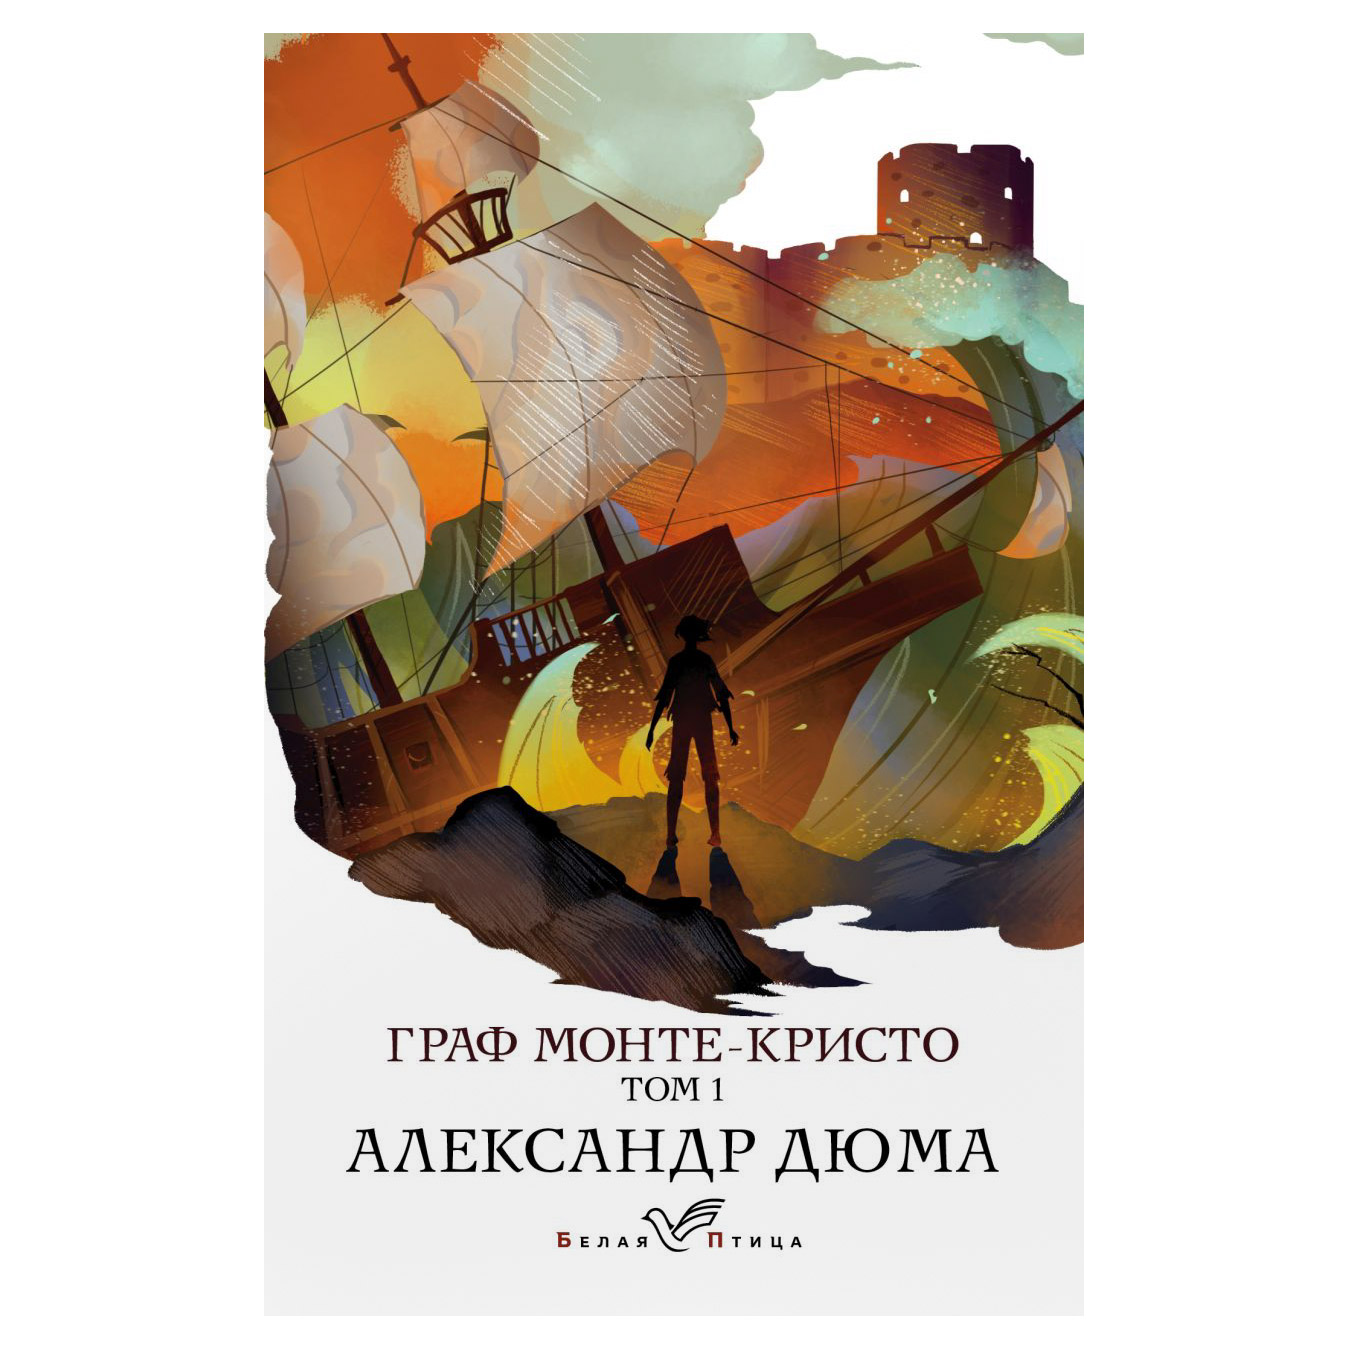 Книга Эксмо Граф Монте-Кристо том 1. Александр Дюма